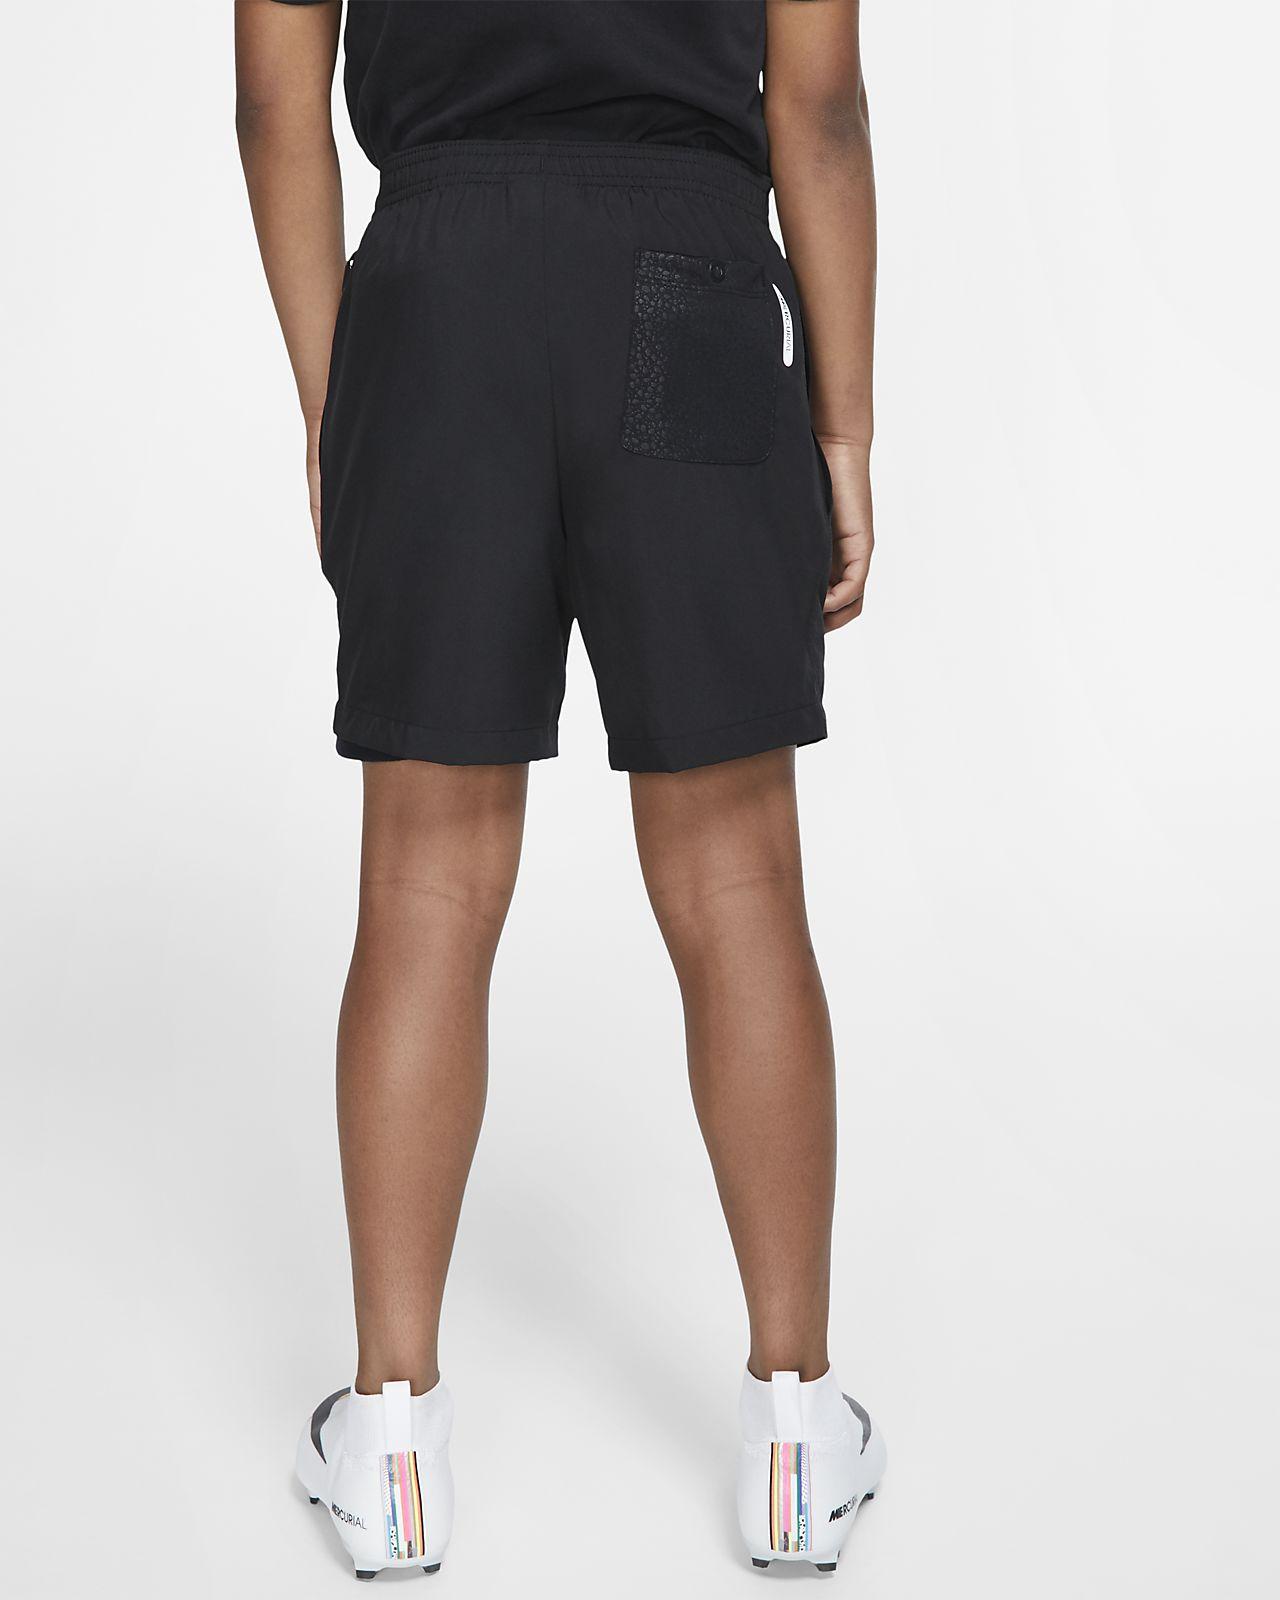 664ffeda1 Nike Dri-FIT Mercurial Older Kids' Football Shorts. Nike.com ZA